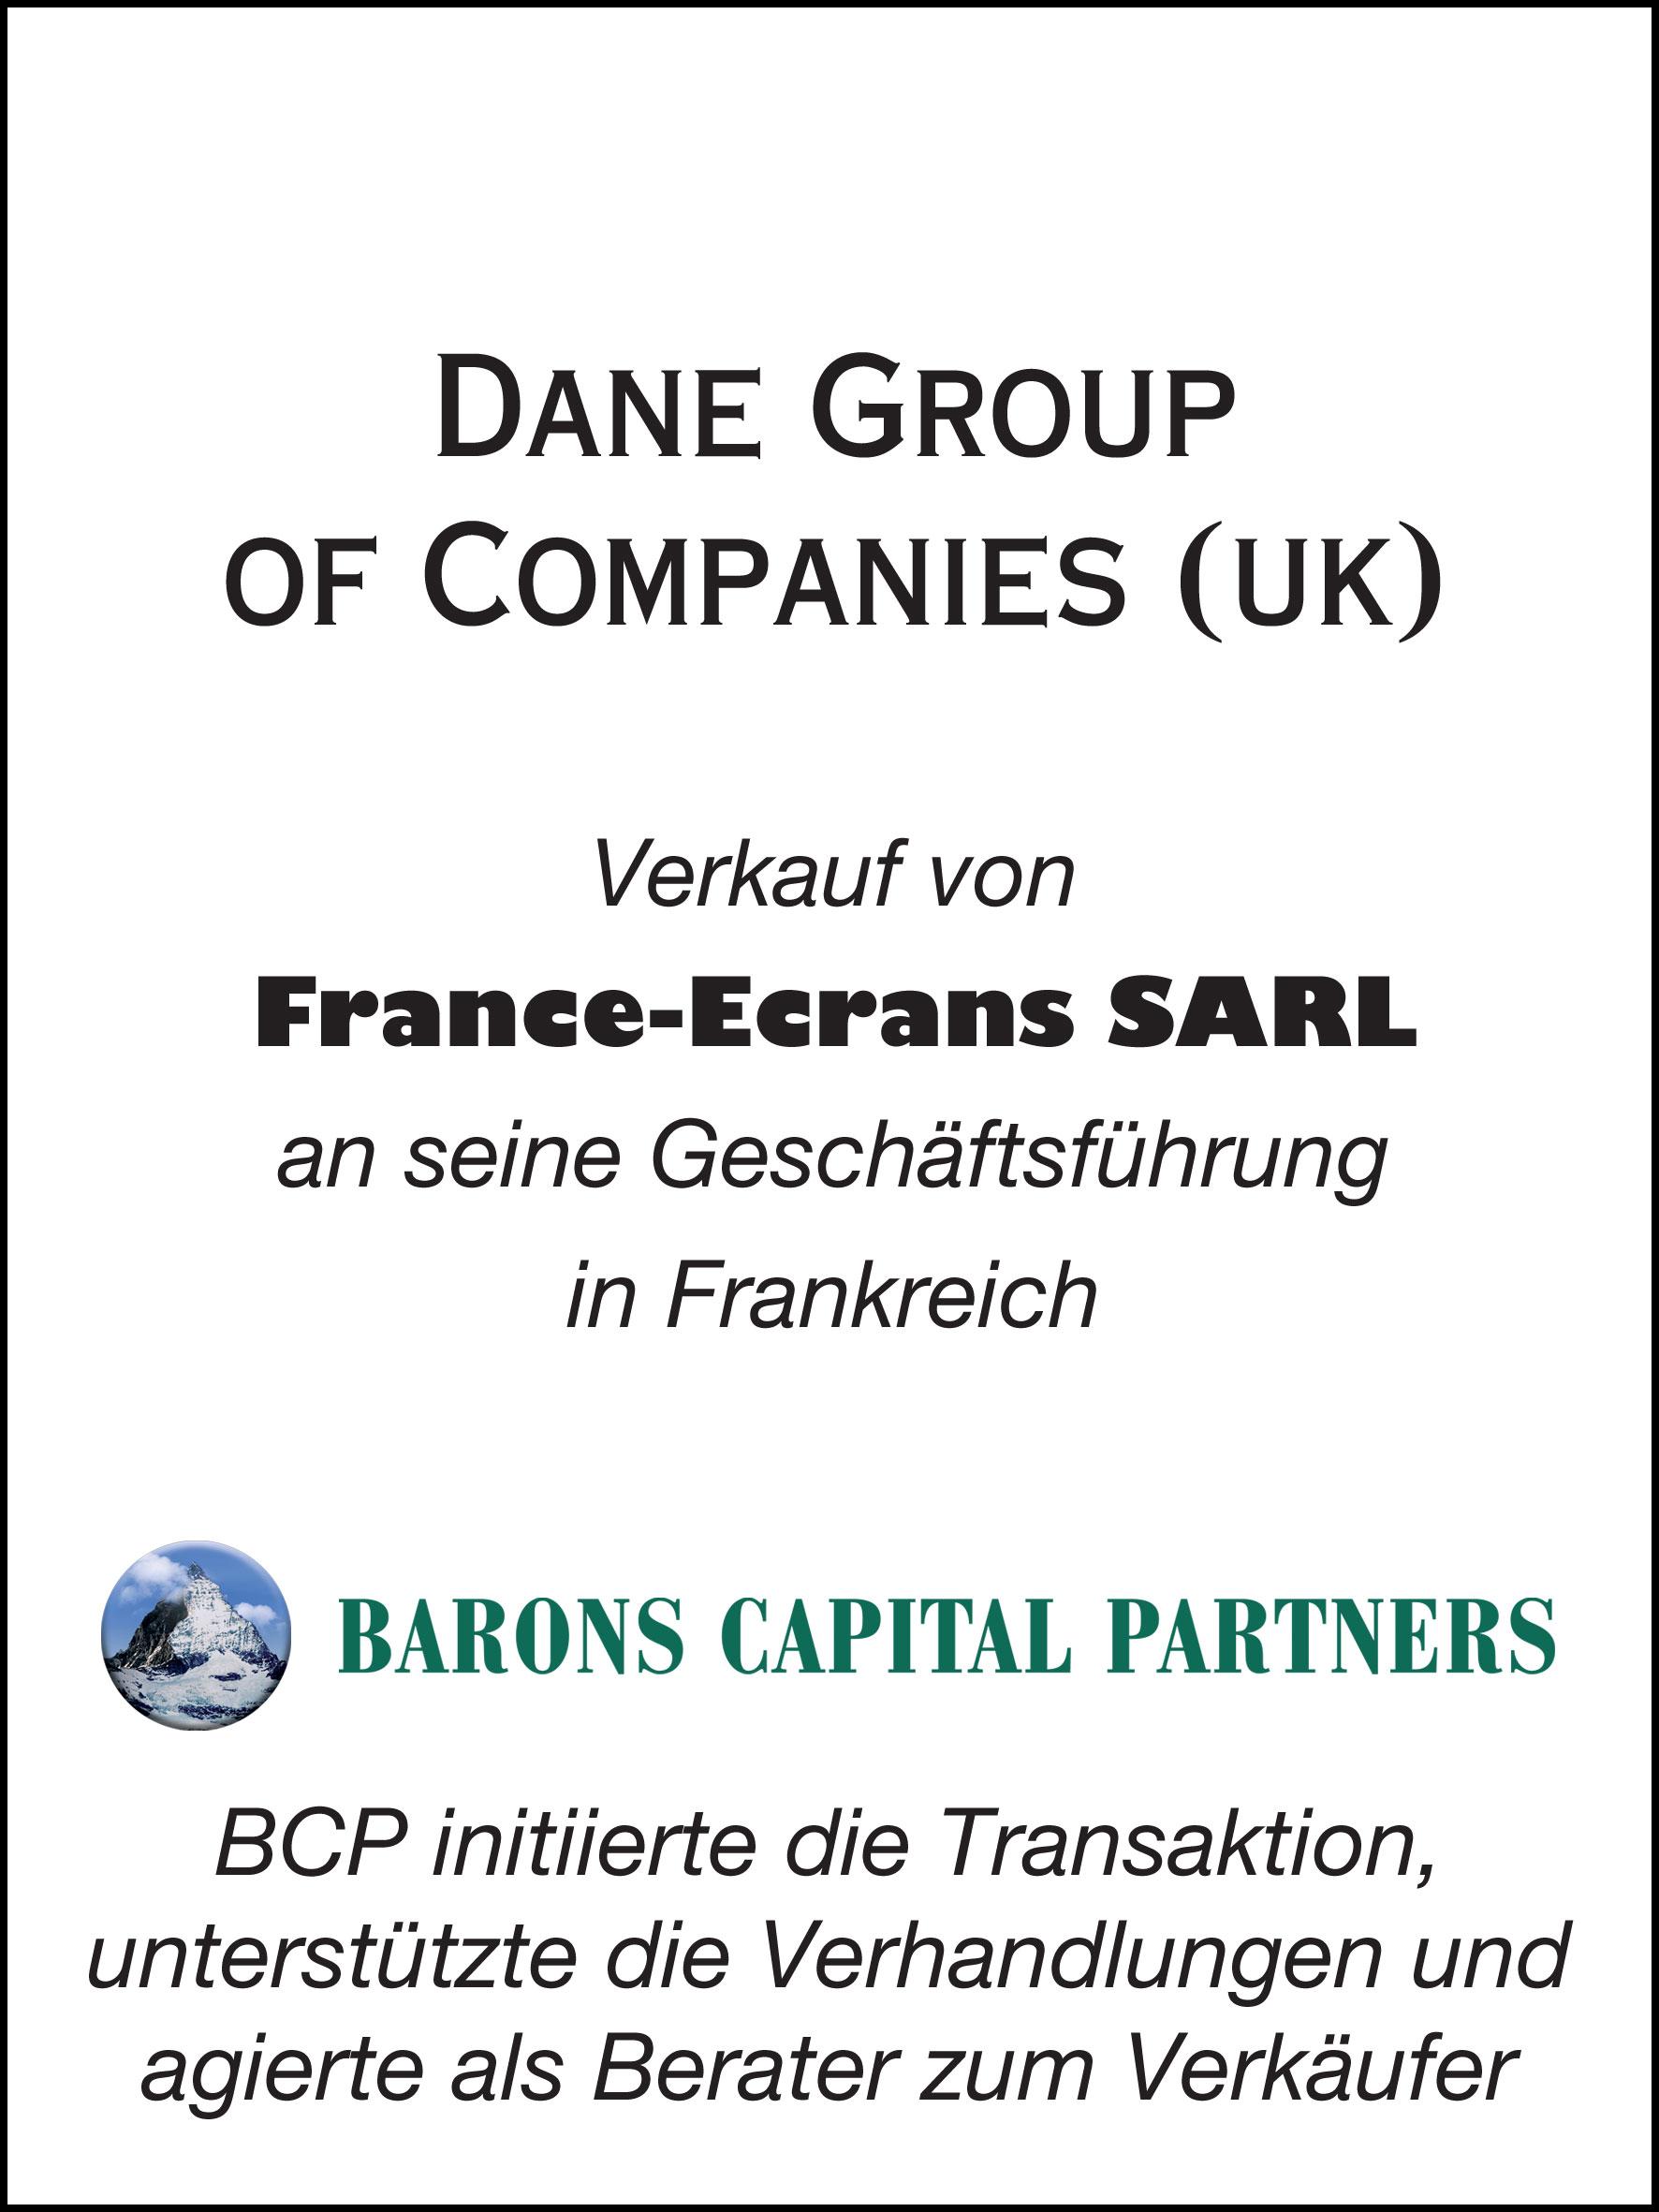 24_Dane Group of Companies (UK)_G